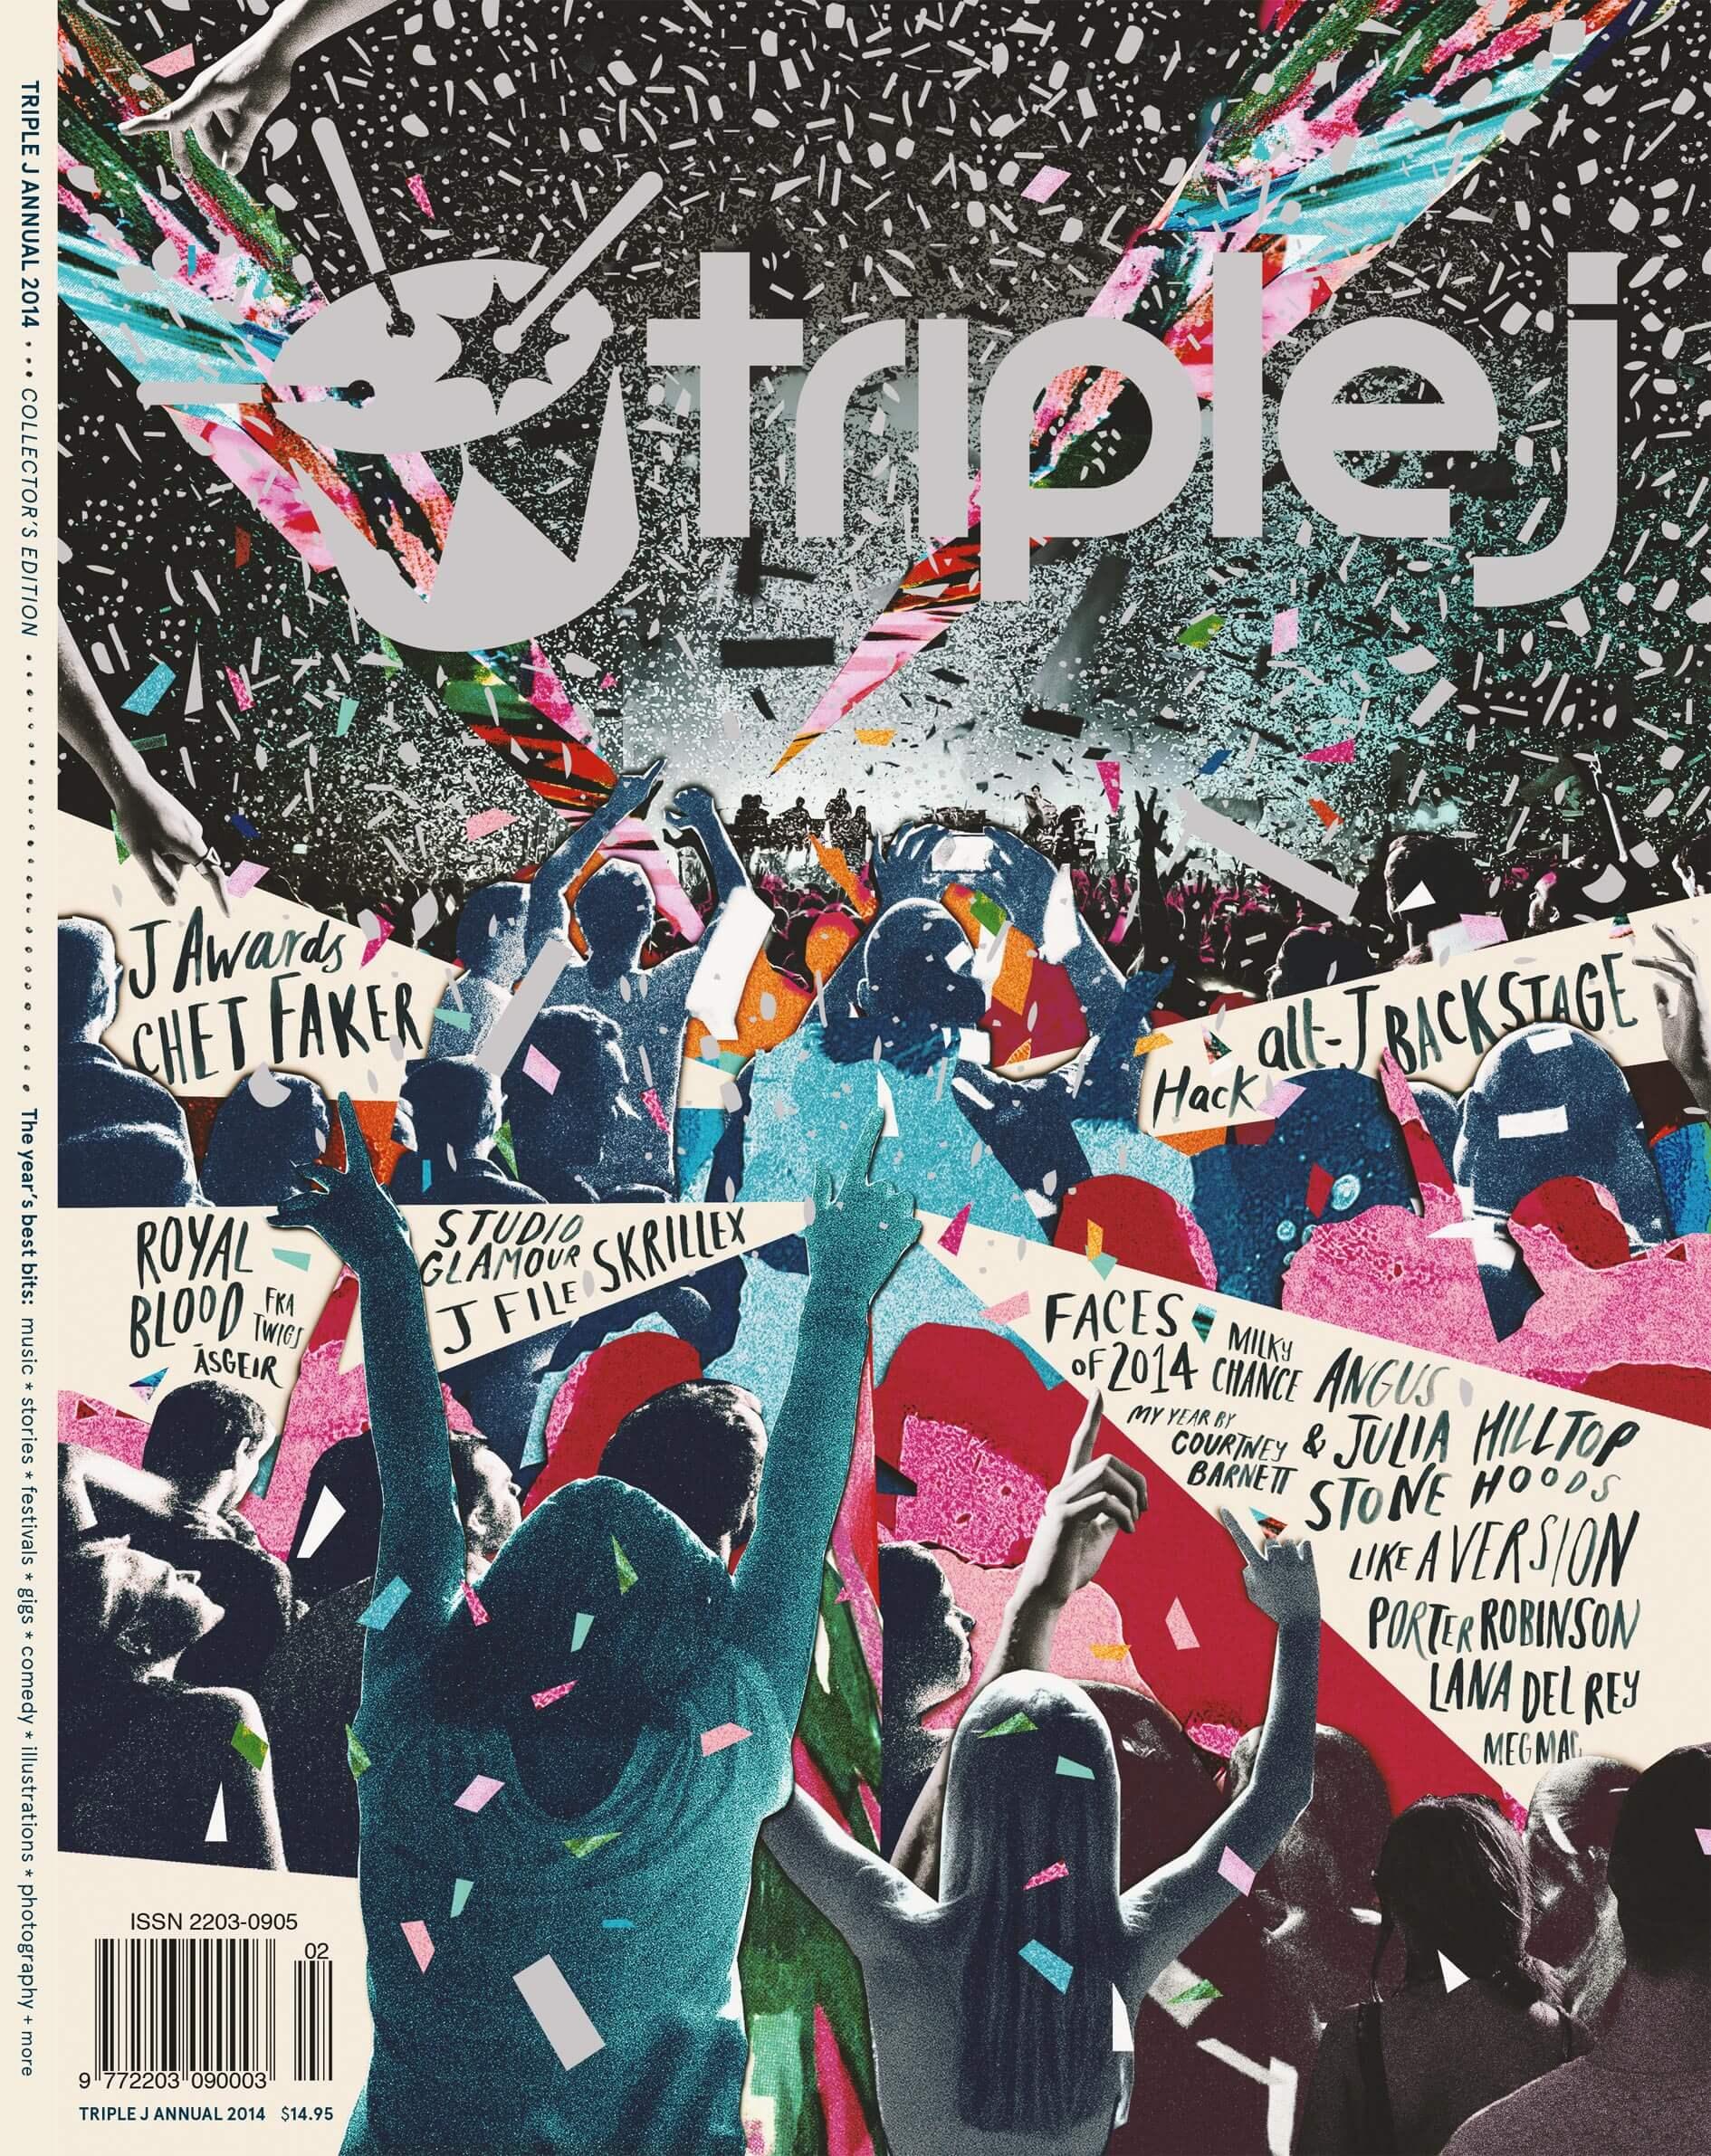 NatCarroll_triplej_Annual_2014_Magazine_CoverConcept_10col